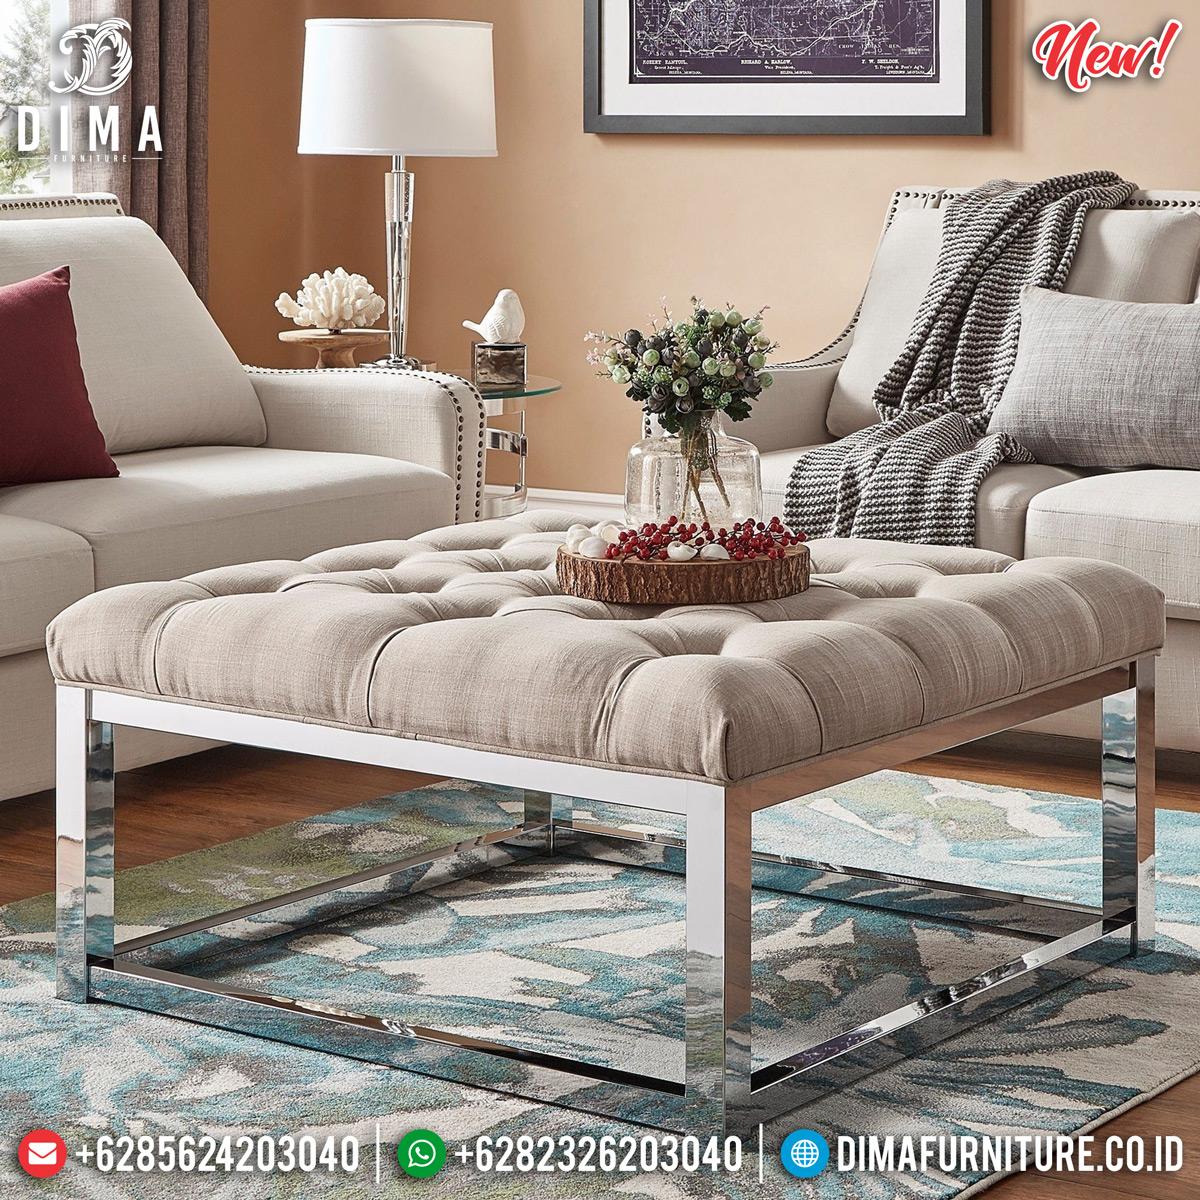 New Meja Tamu Minimalis Stainless Steel Glamorous Design Guaranteed TTJ-0831 Design 1